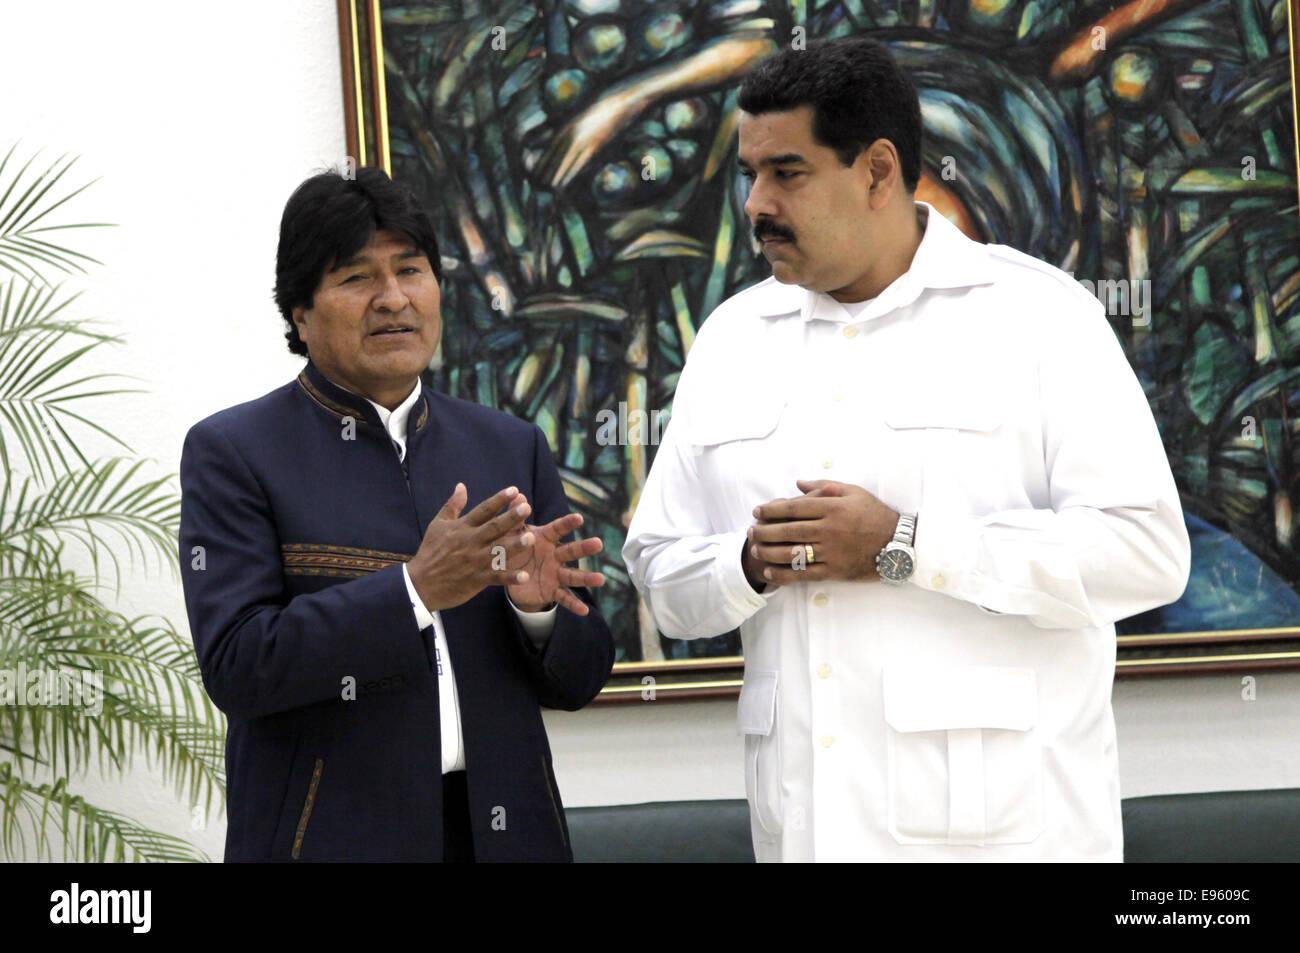 (141020) -- HAVANA, Oct. 20, 2014 (Xinhua) -- Bolivian President Evo Morales talks with his Venezuelan counterpart Stock Photo